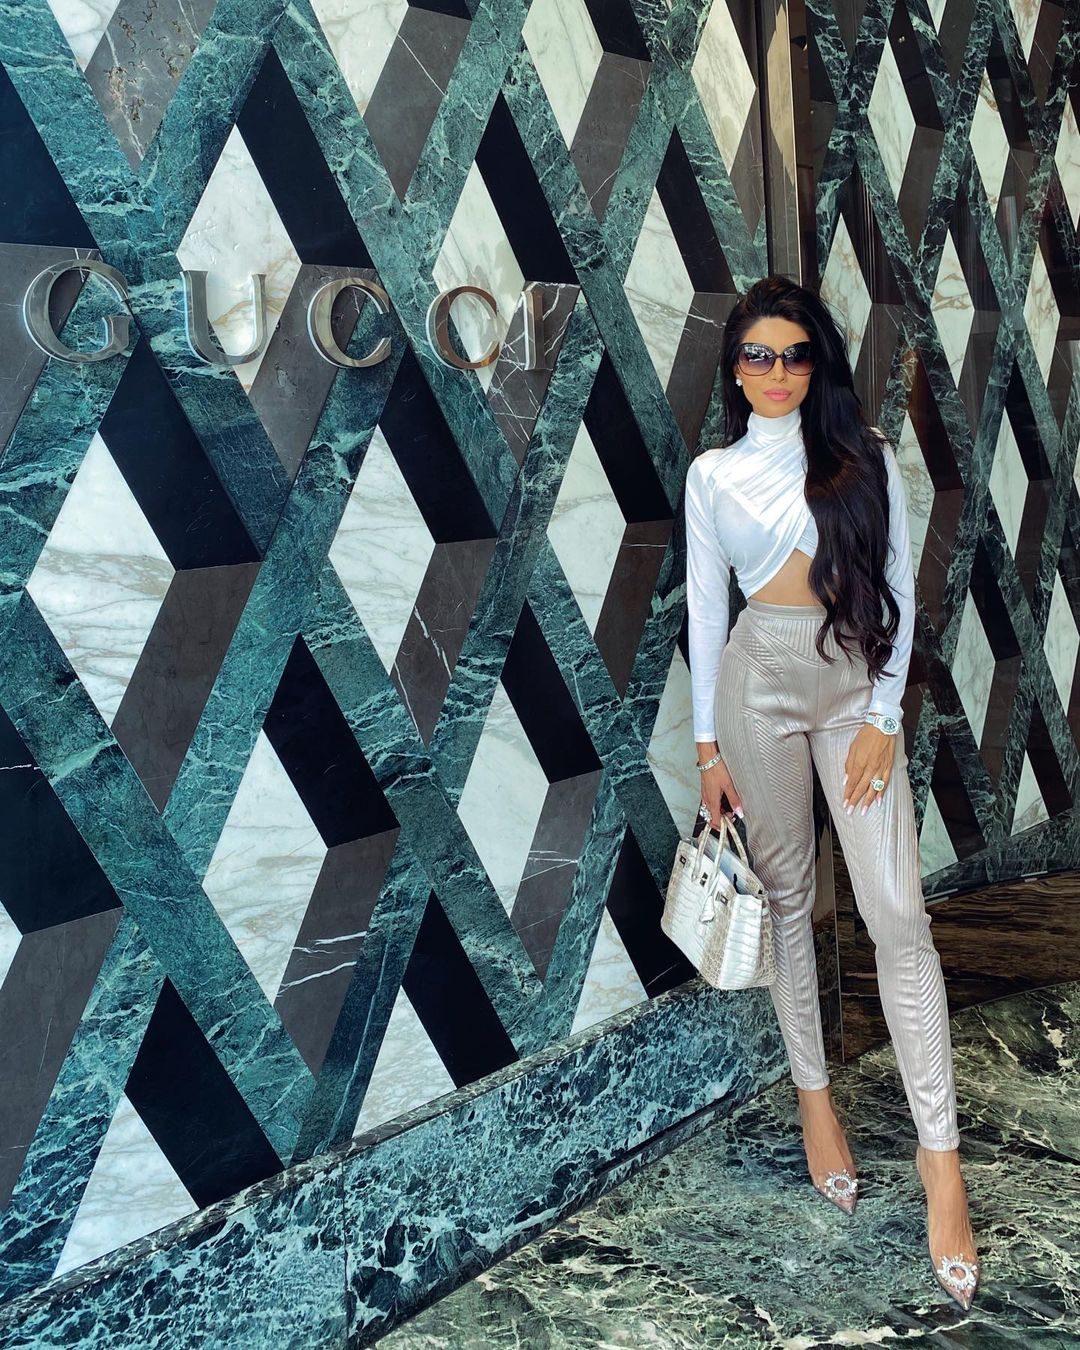 Leyla-Milani-Khoshbin-Wallpapers-Insta-Fit-Bio-3